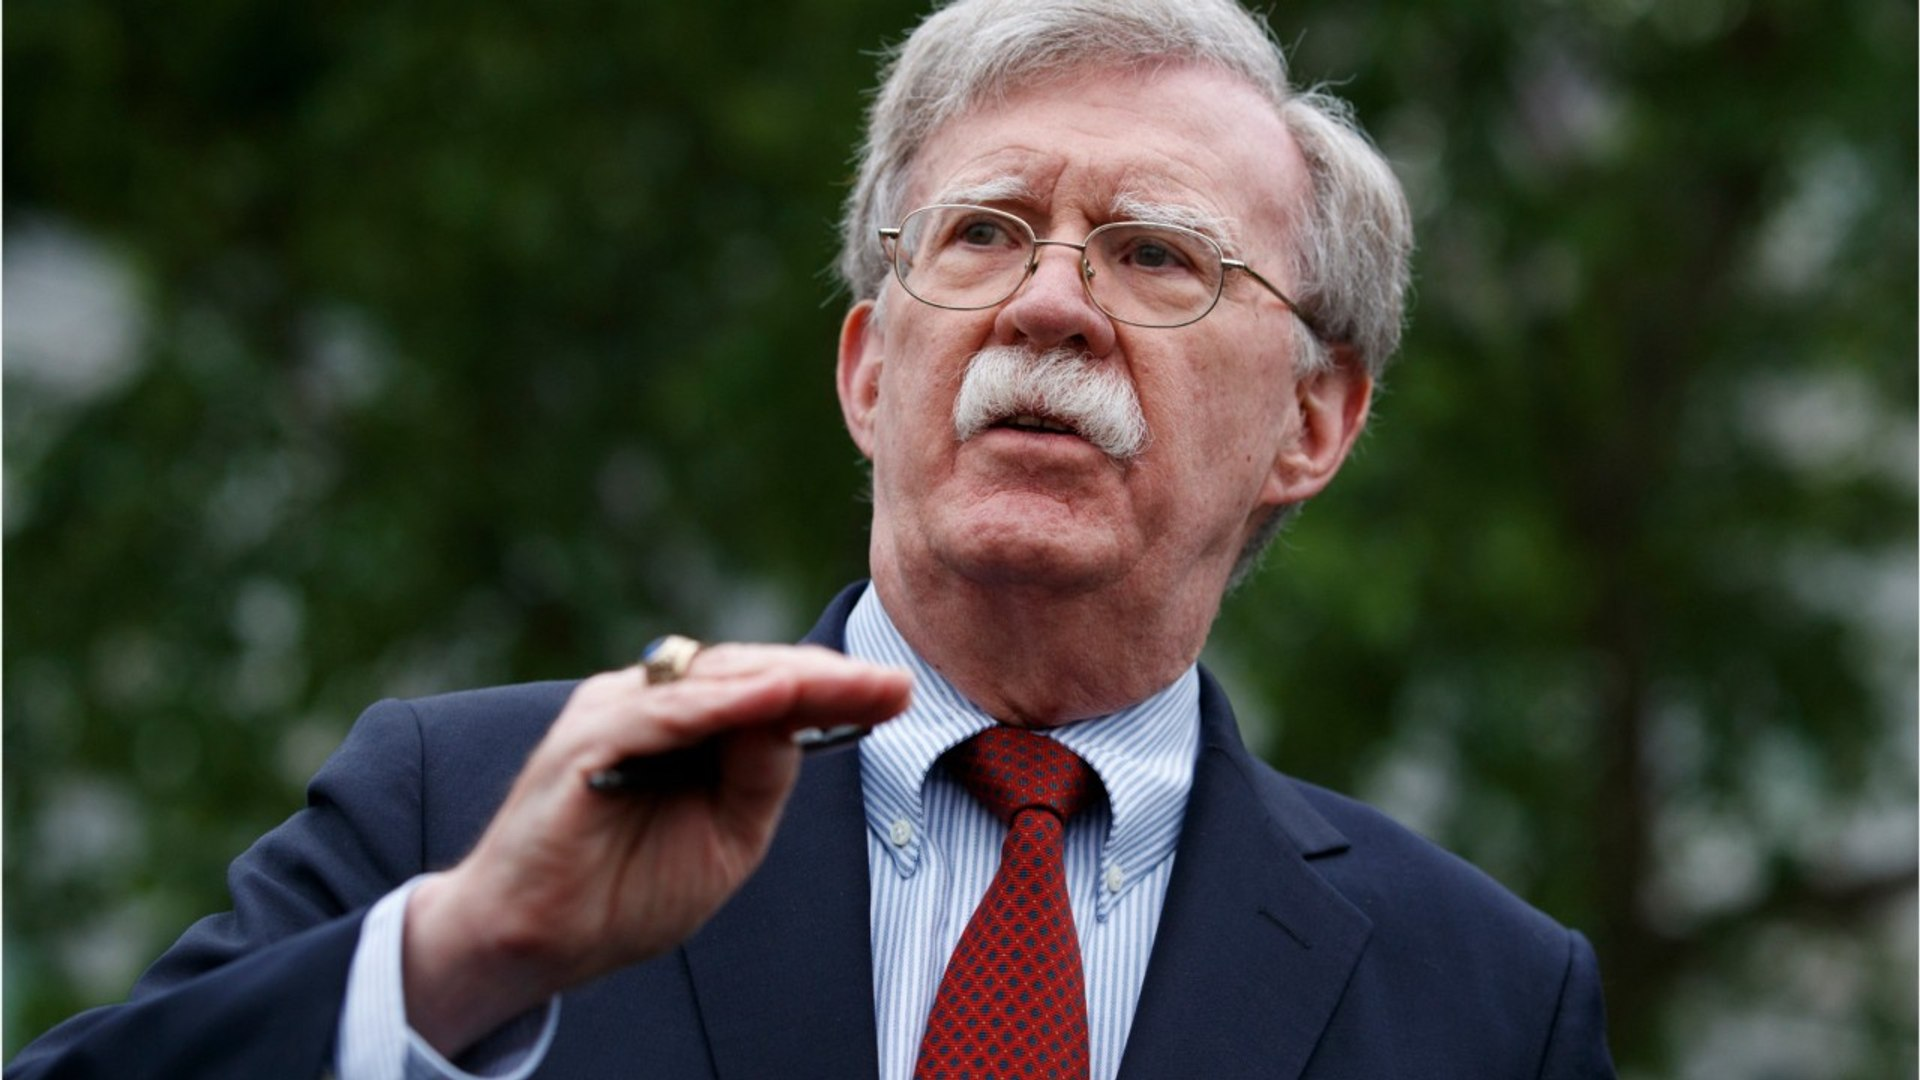 Trump Wants Iranian War, Iran Issues Warning